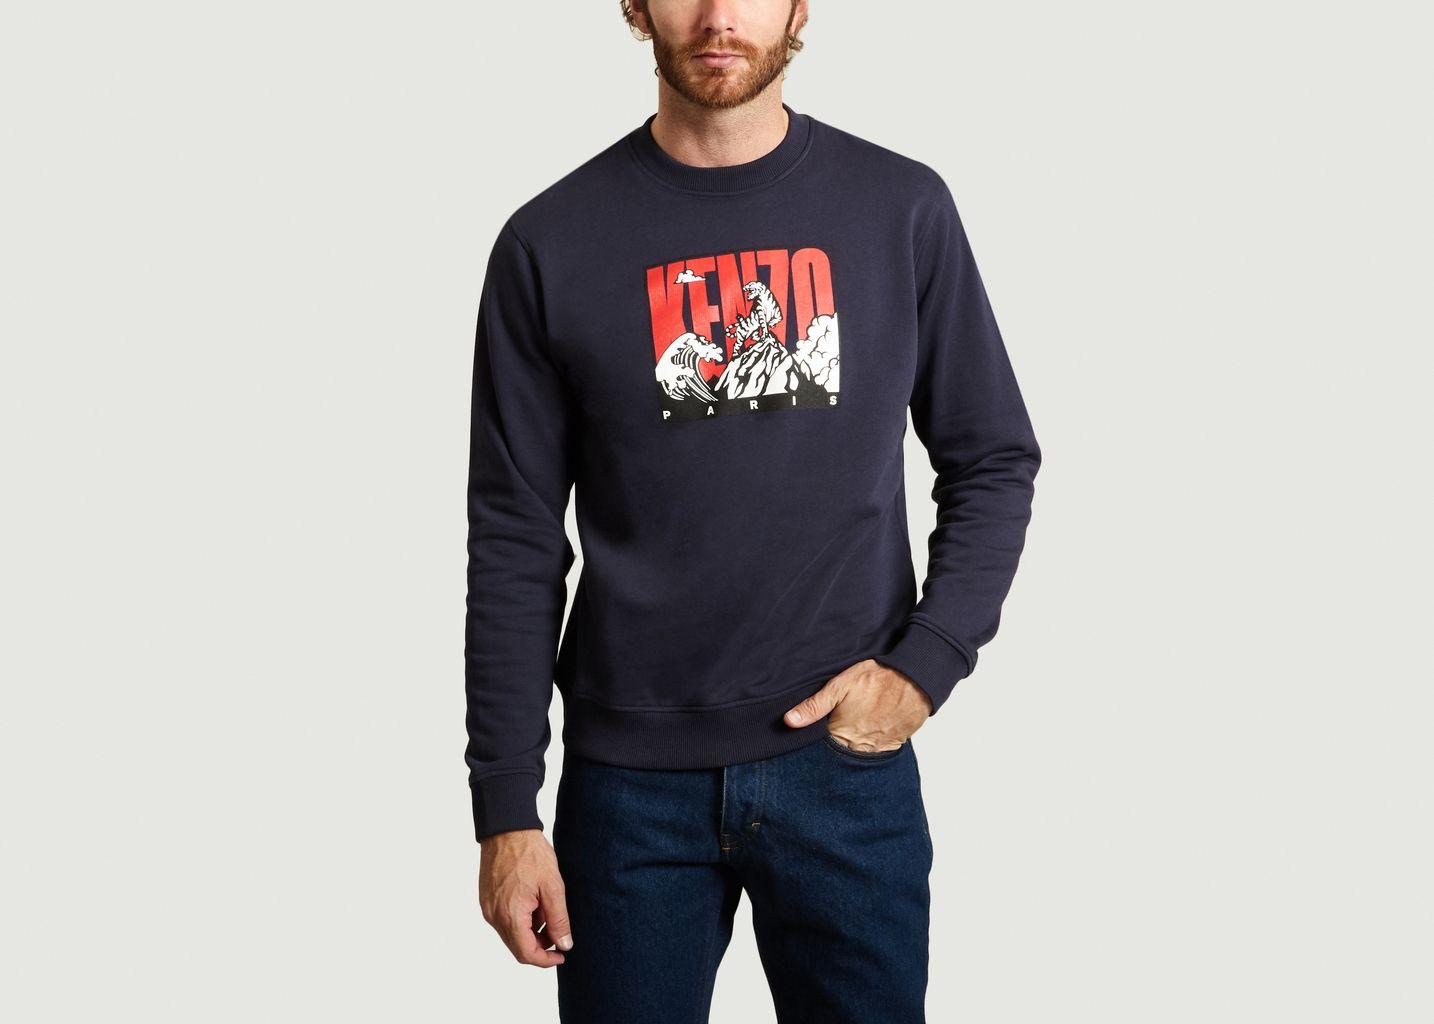 Tiger Mountain sweatshirt